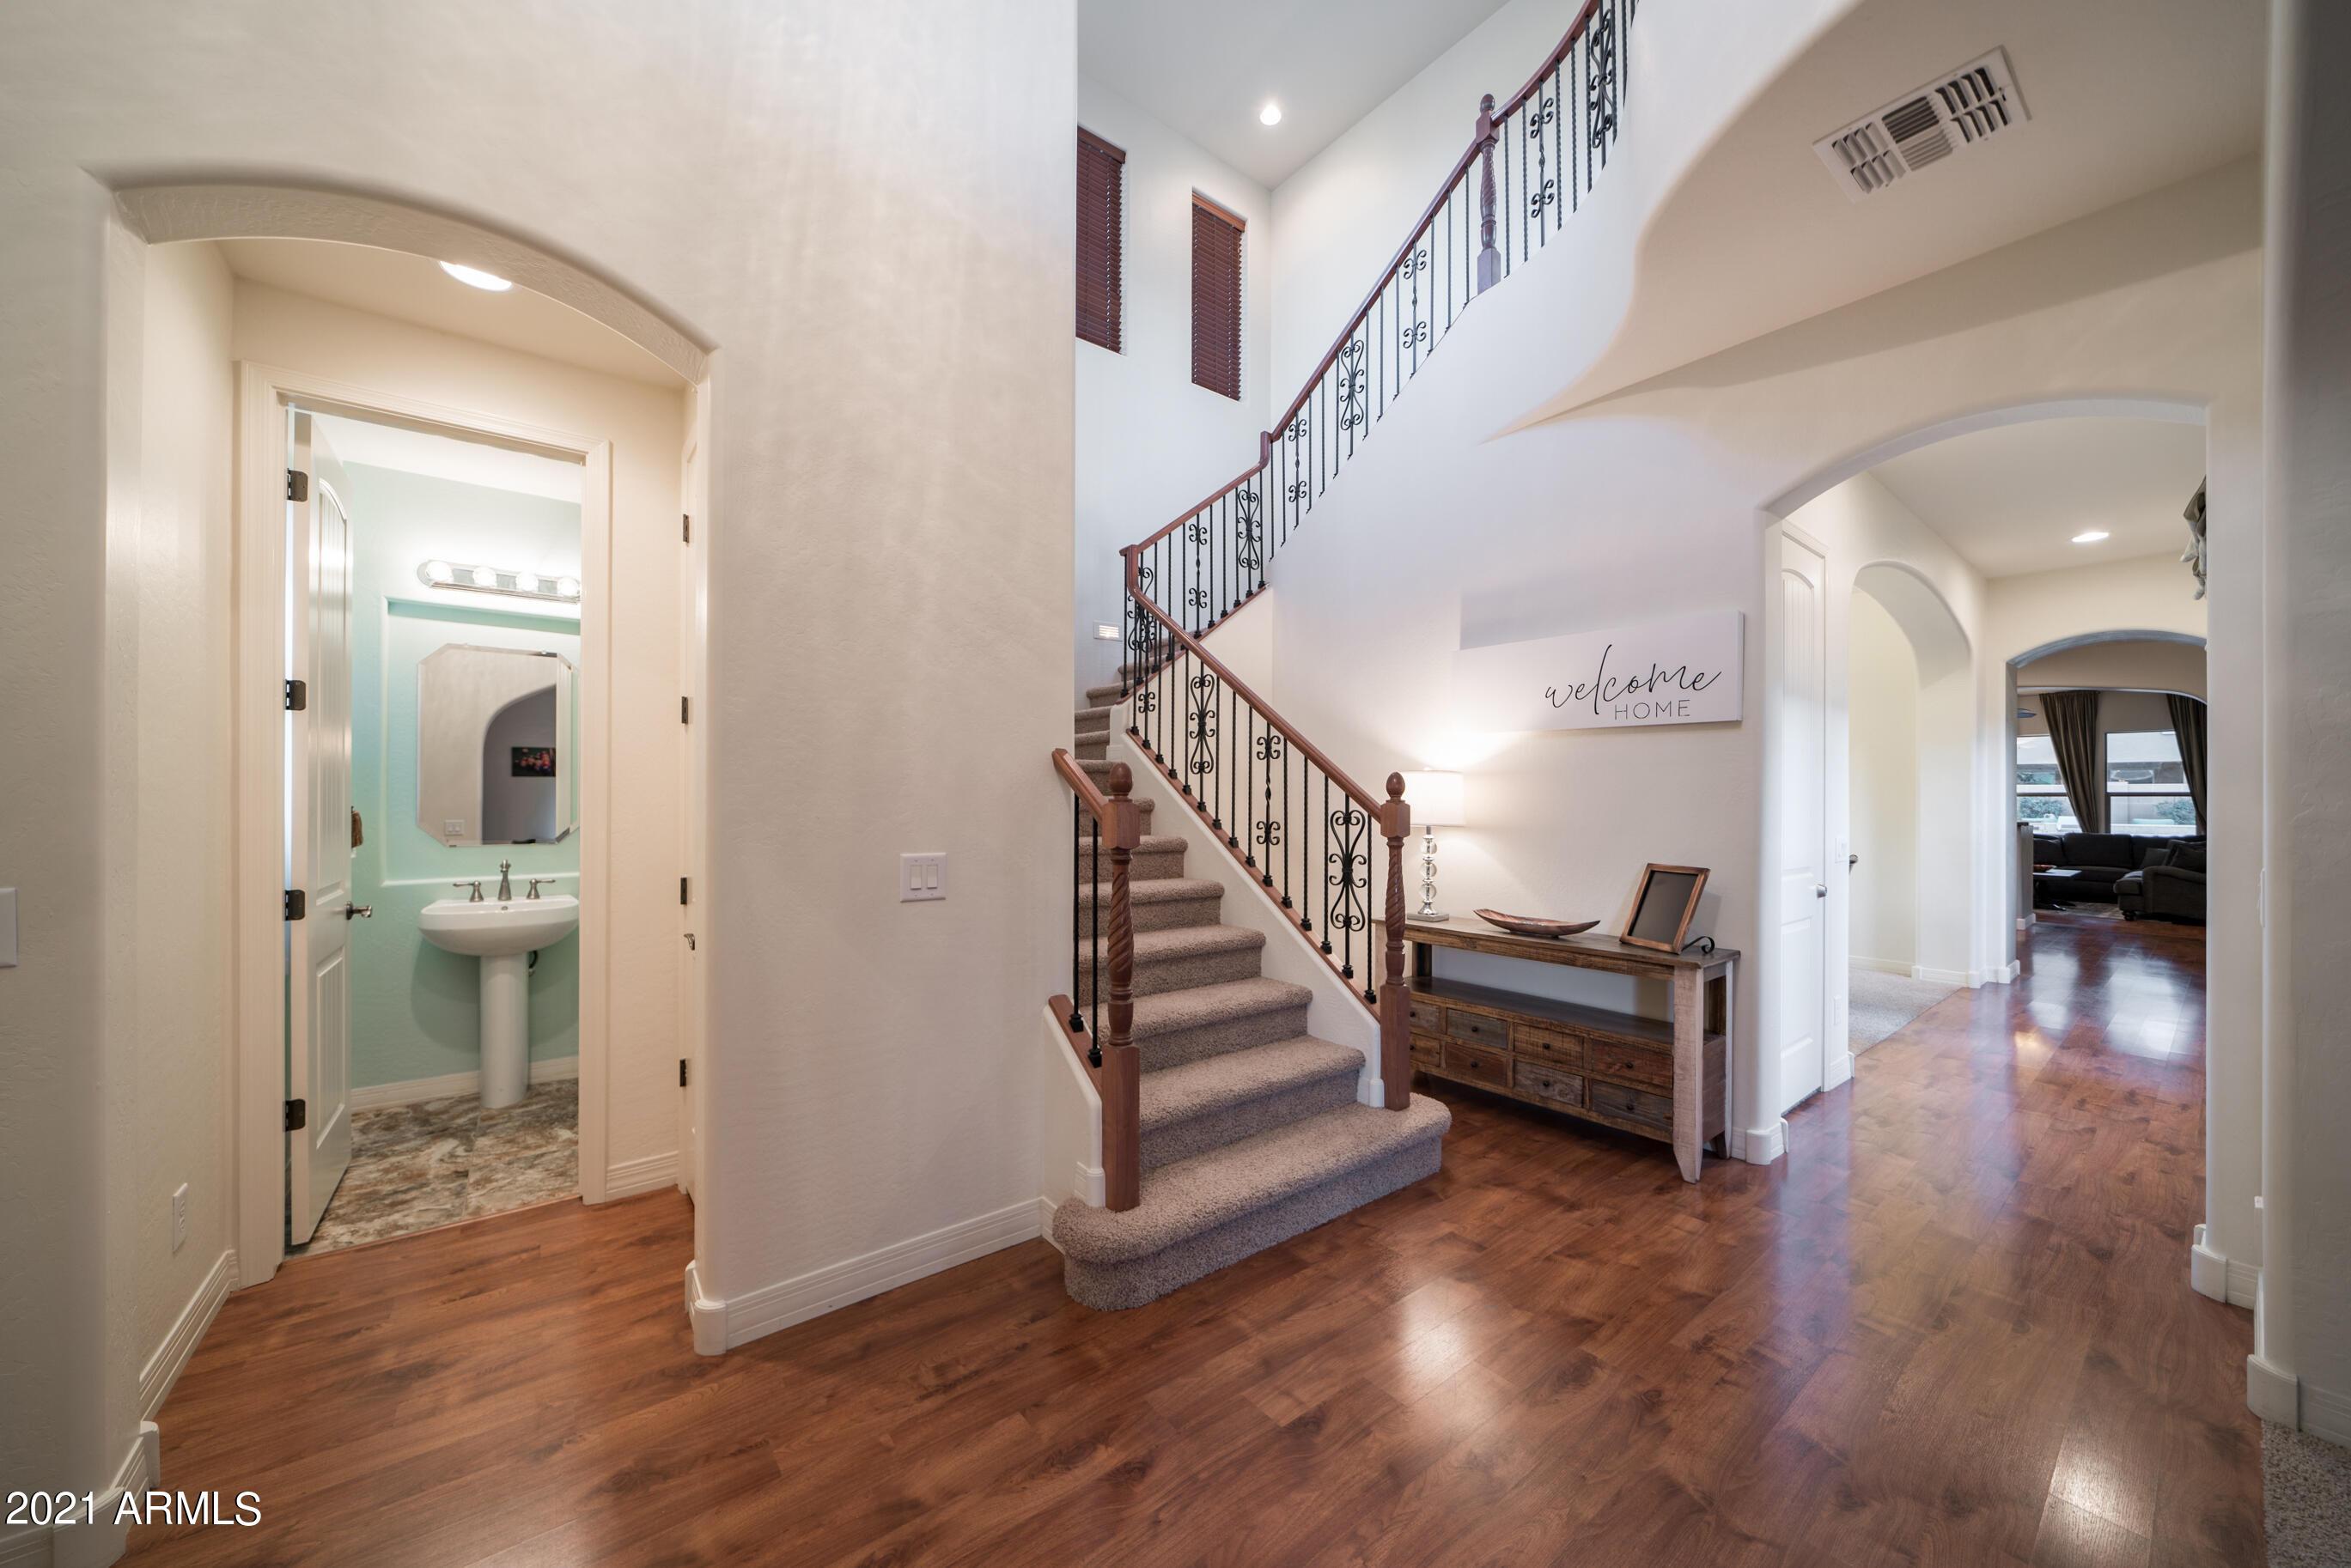 2681 E HAMPTON Lane, Gilbert, AZ 85295, 5 Bedrooms Bedrooms, ,Residential Lease,For Rent,2681 E HAMPTON Lane,6224454